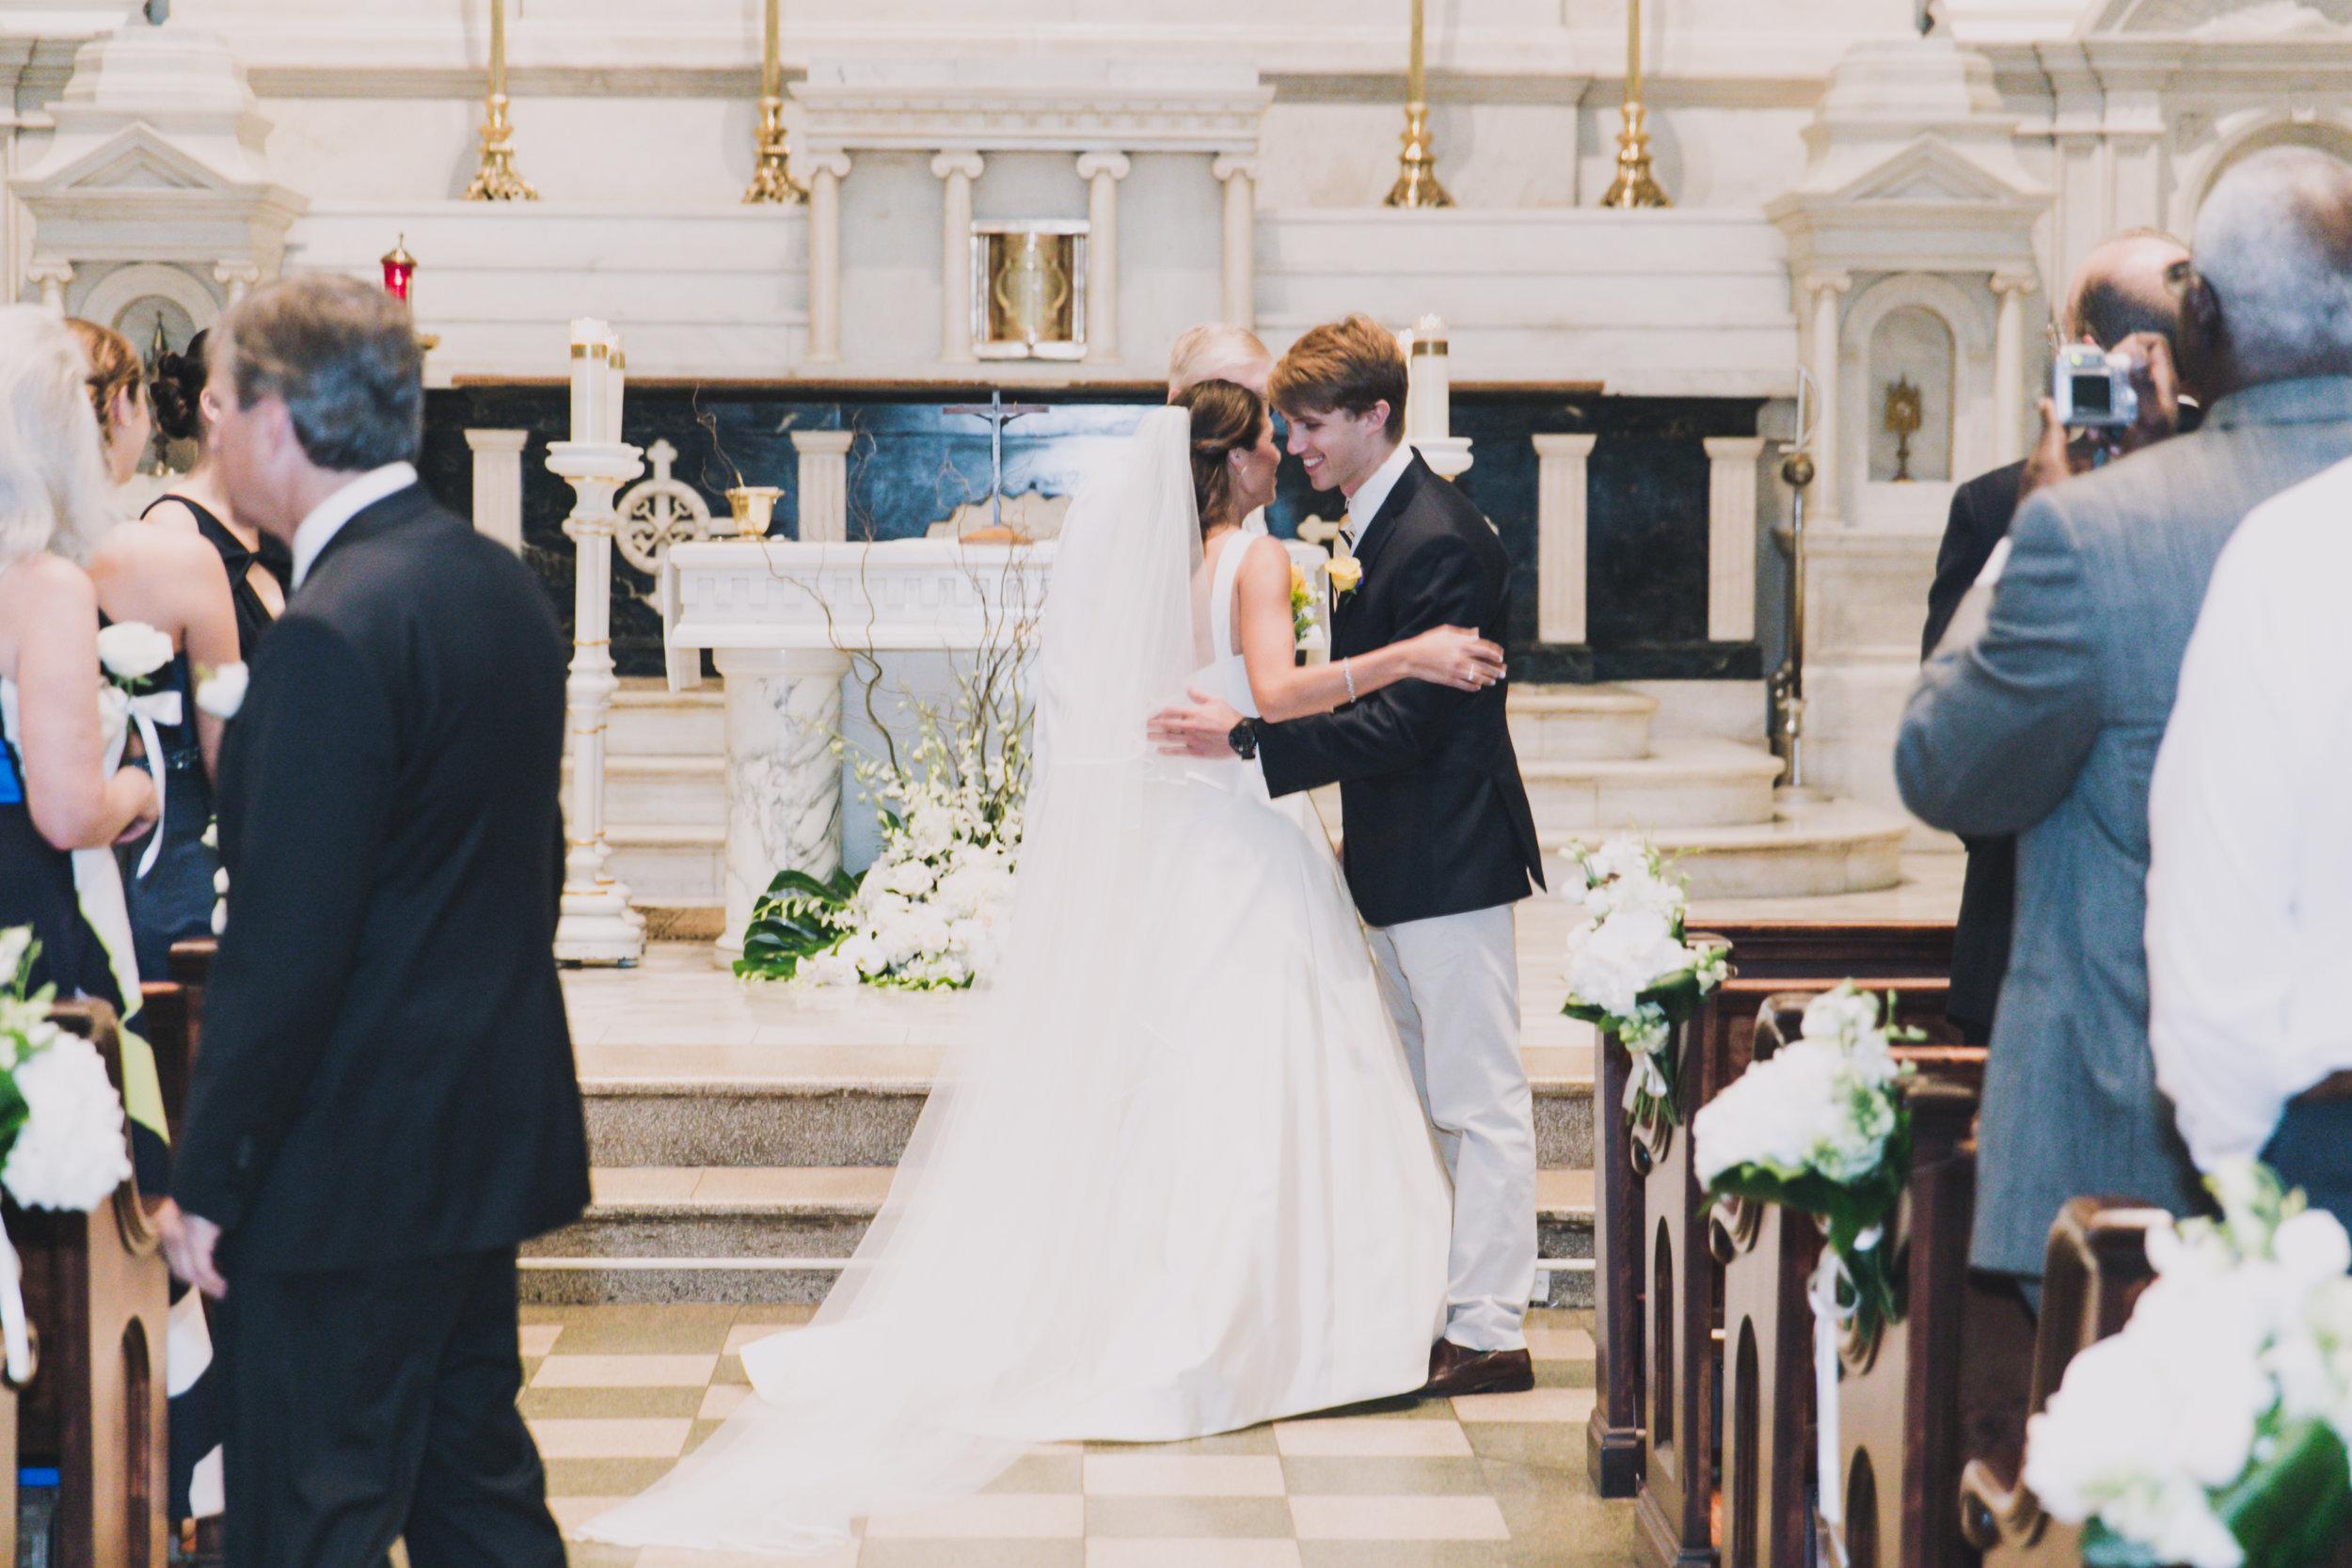 Madeleine_Matt_Wedding_Slideshow_Jpegs-059.jpg